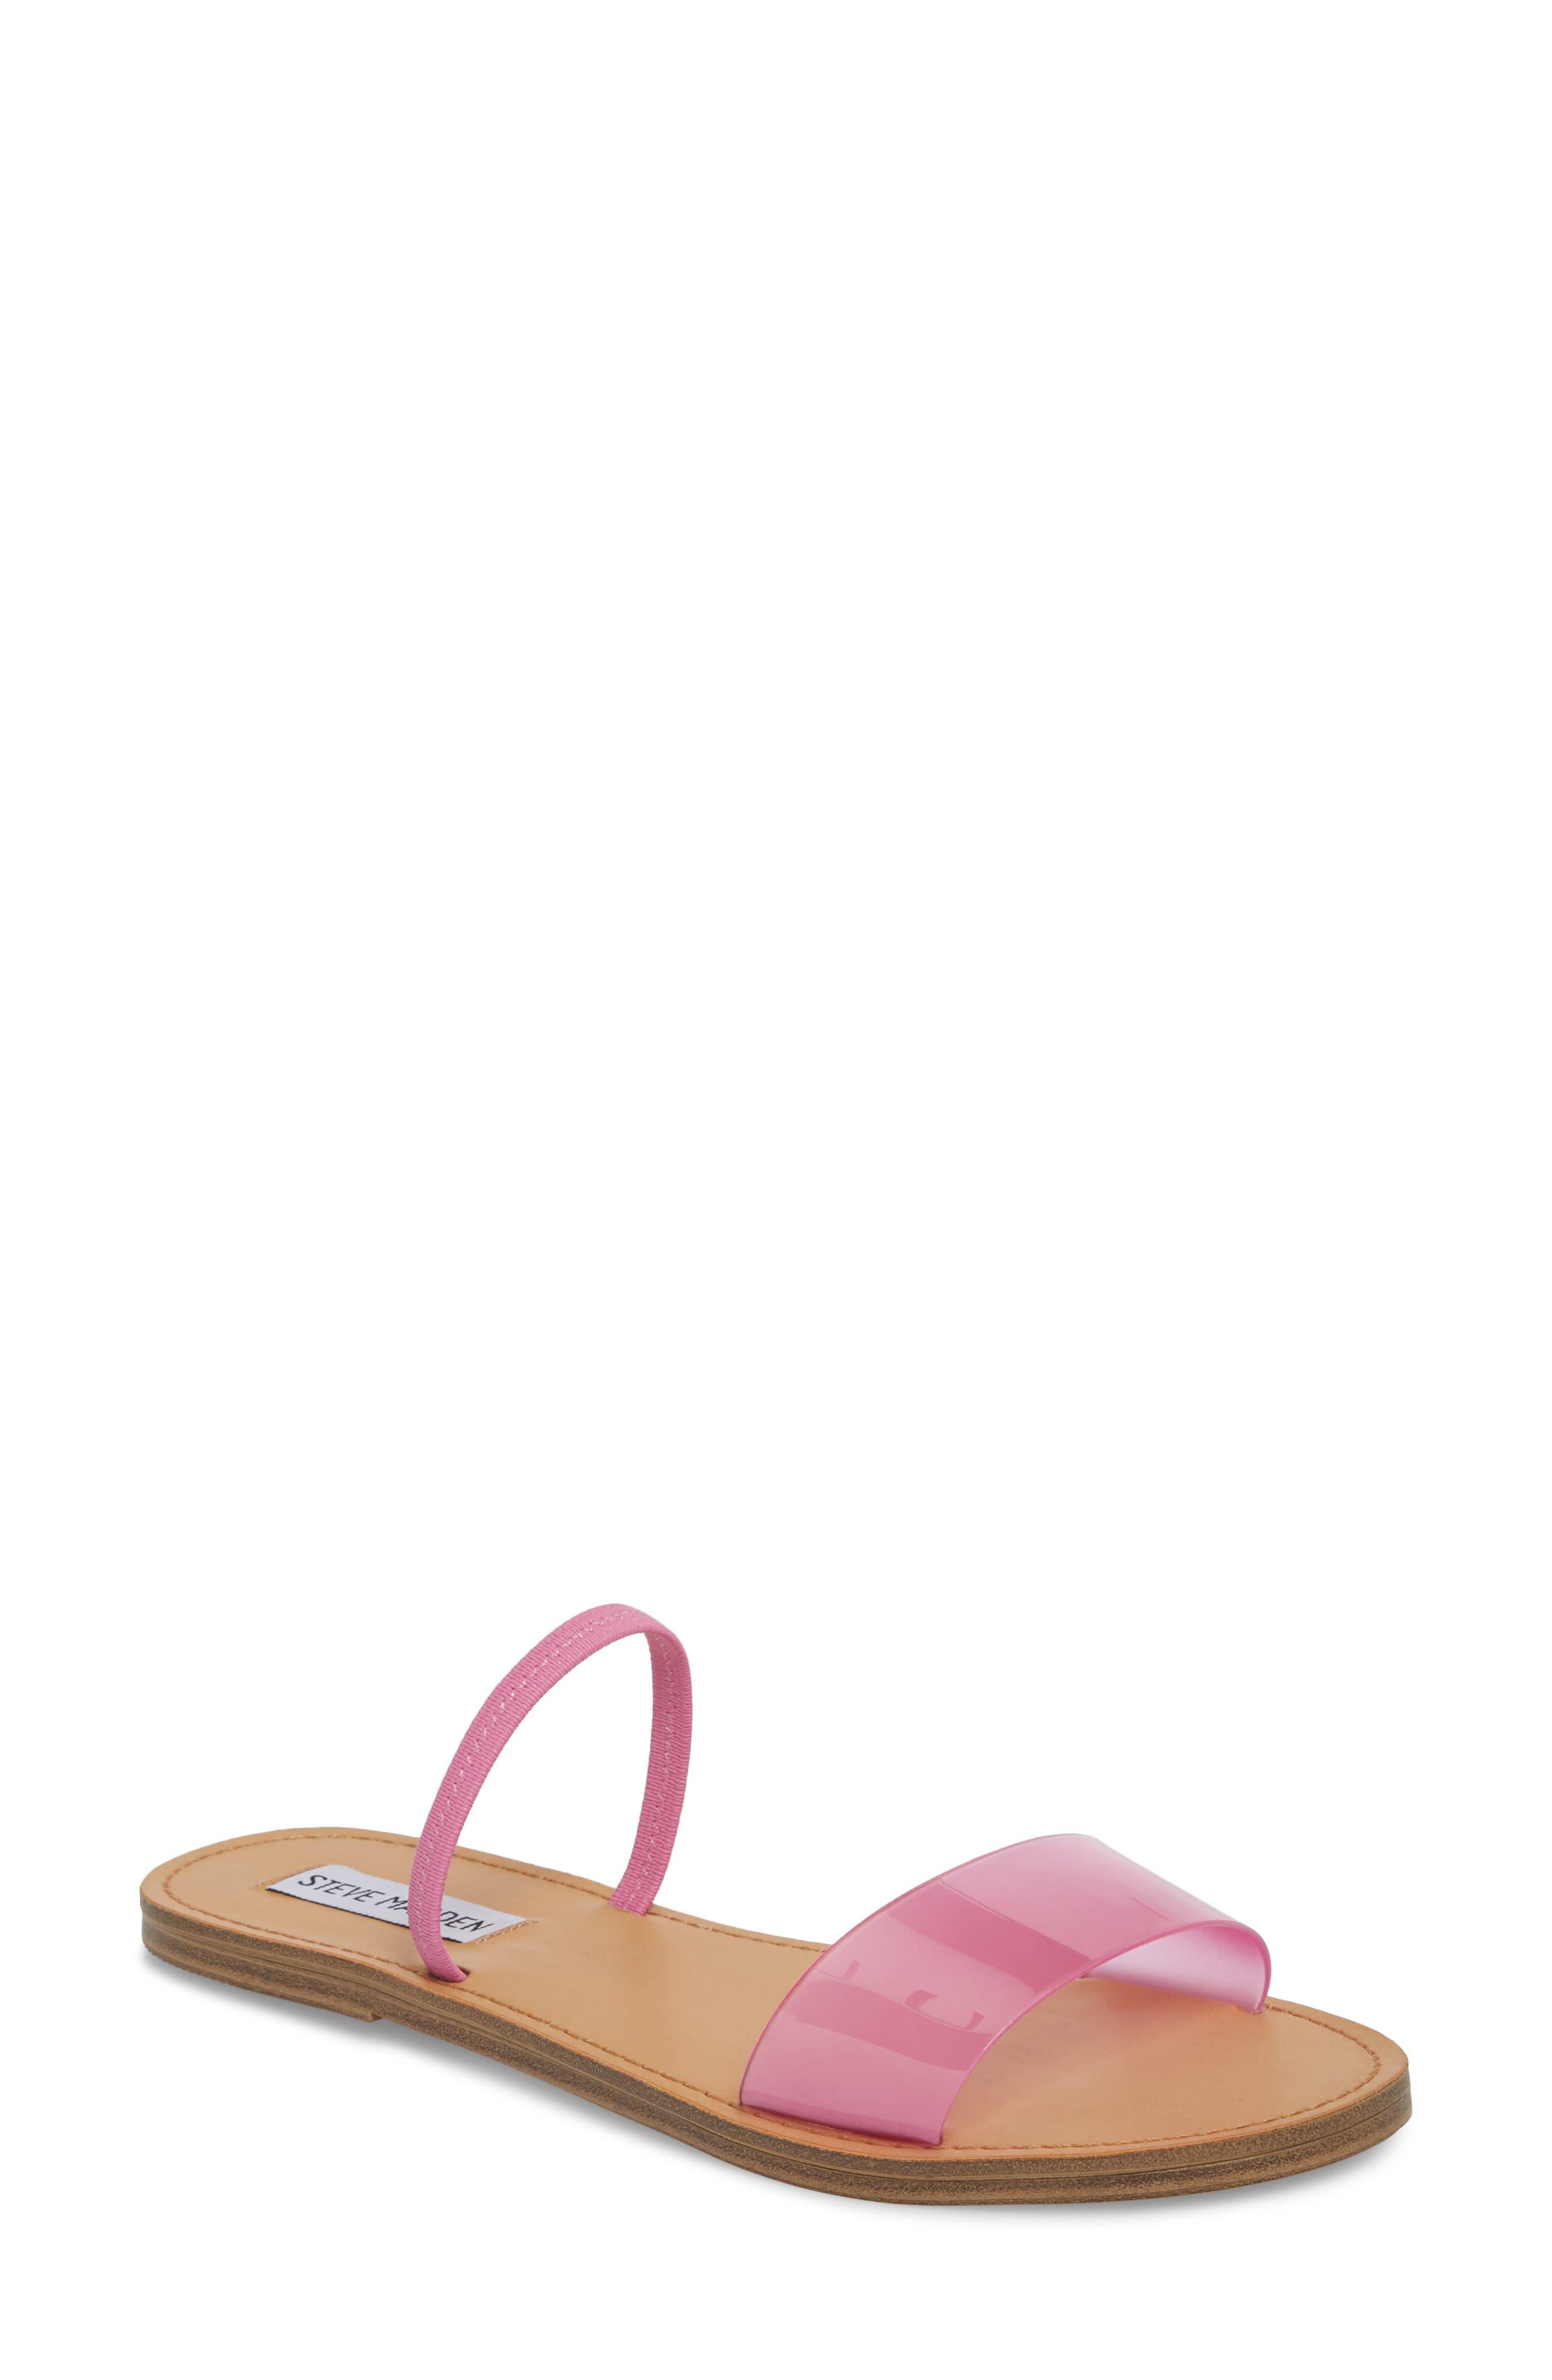 Dasha Strappy Slide Sandal,                             Main thumbnail 2, color,